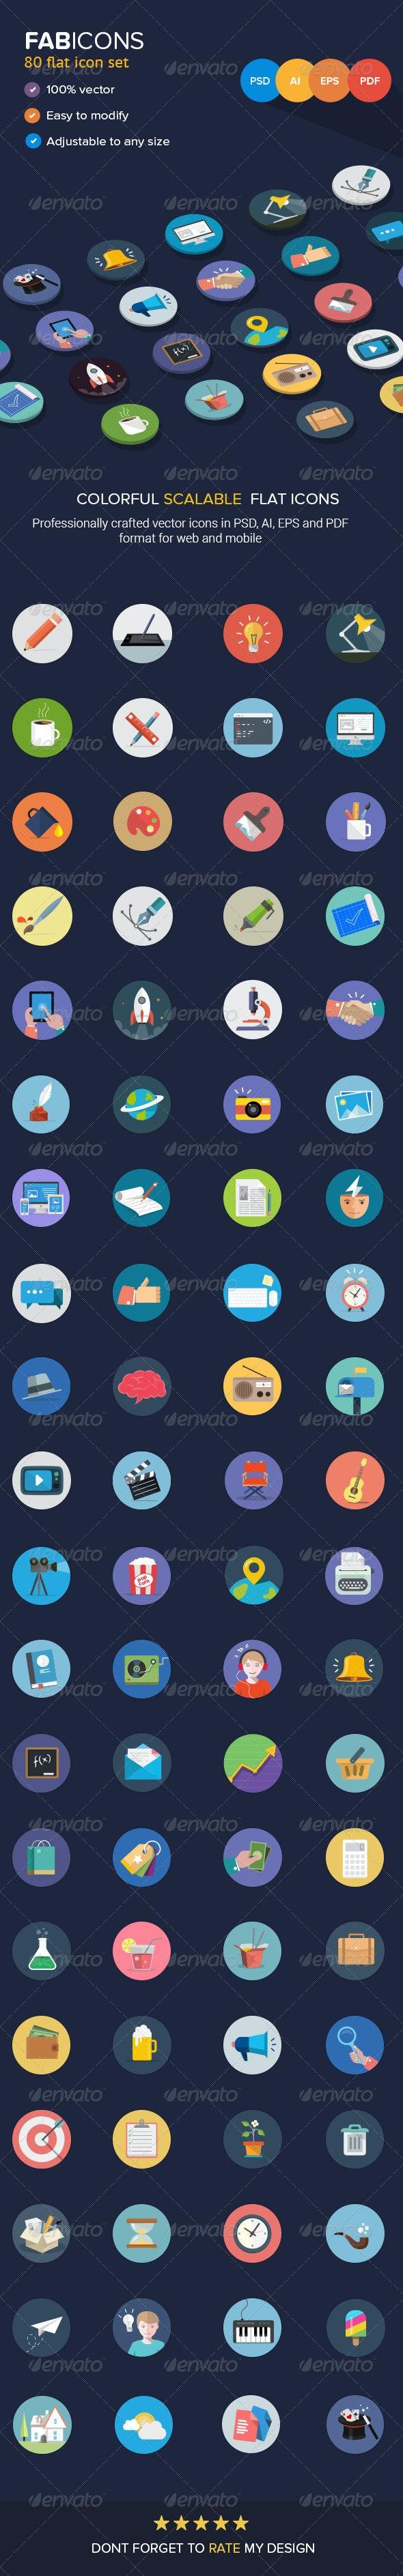 80 Fresh Flat Vector Icons - Web Icons